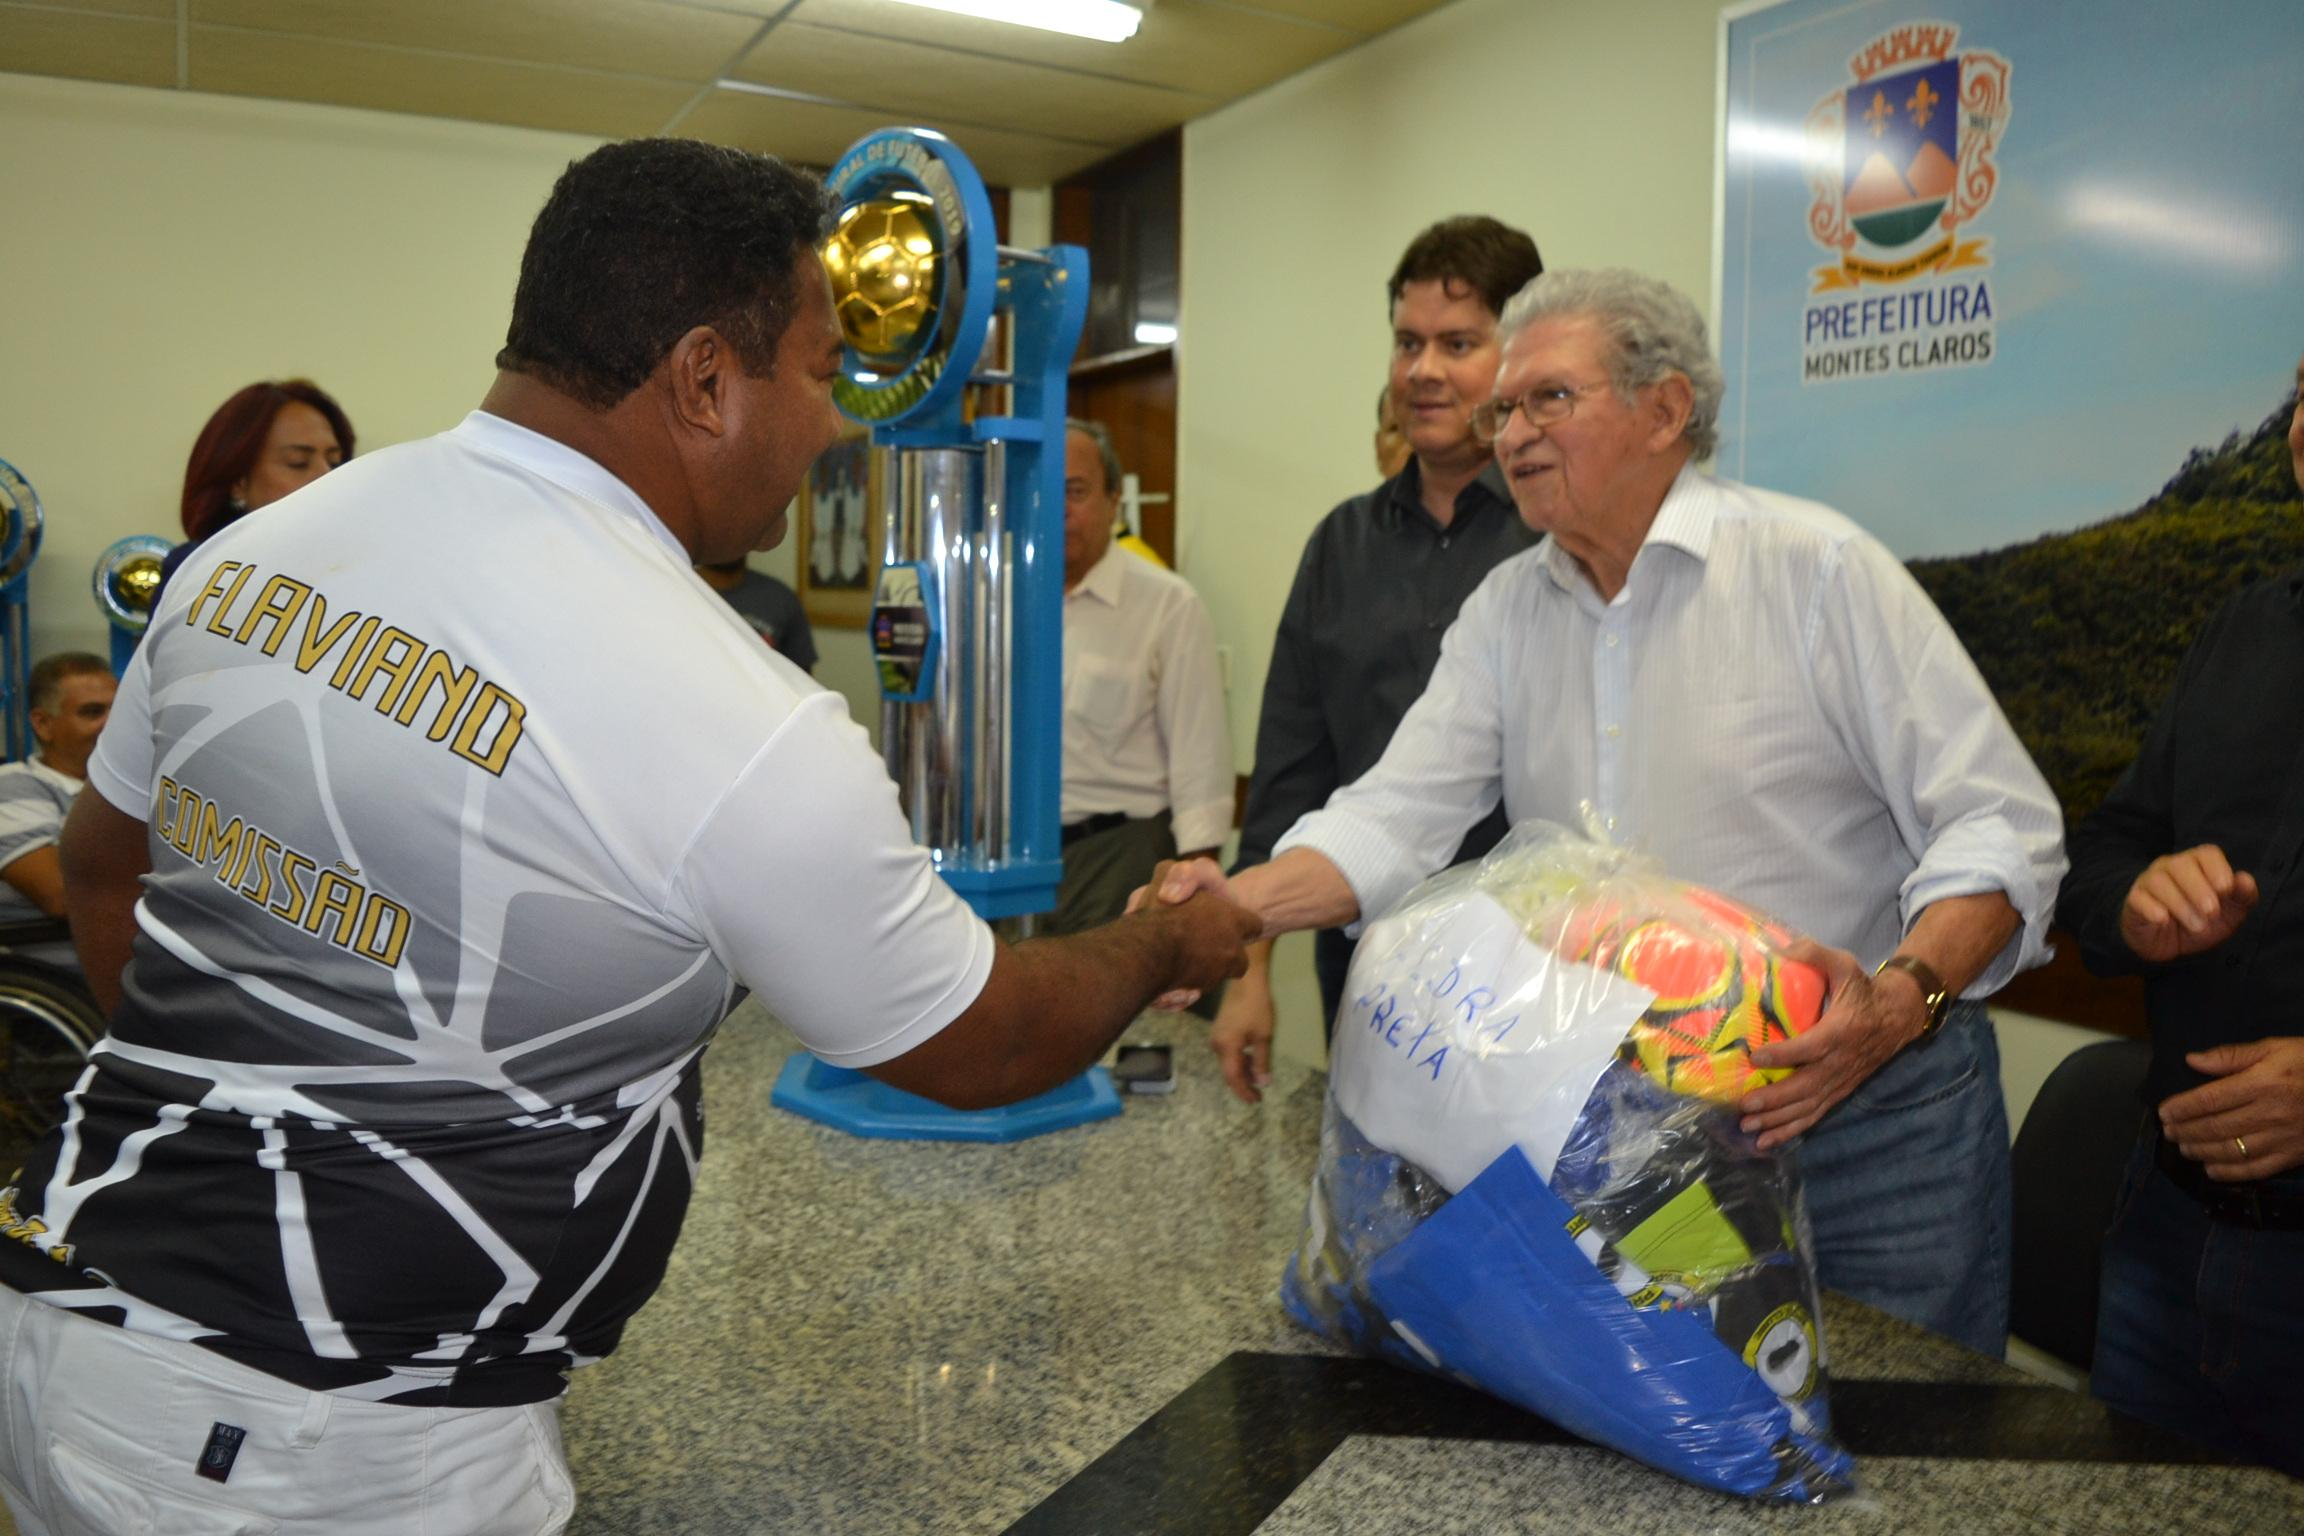 Imagem de destaque Prefeitura realiza entrega de material esportivo para atletas dos campeonatos Amador e Rural